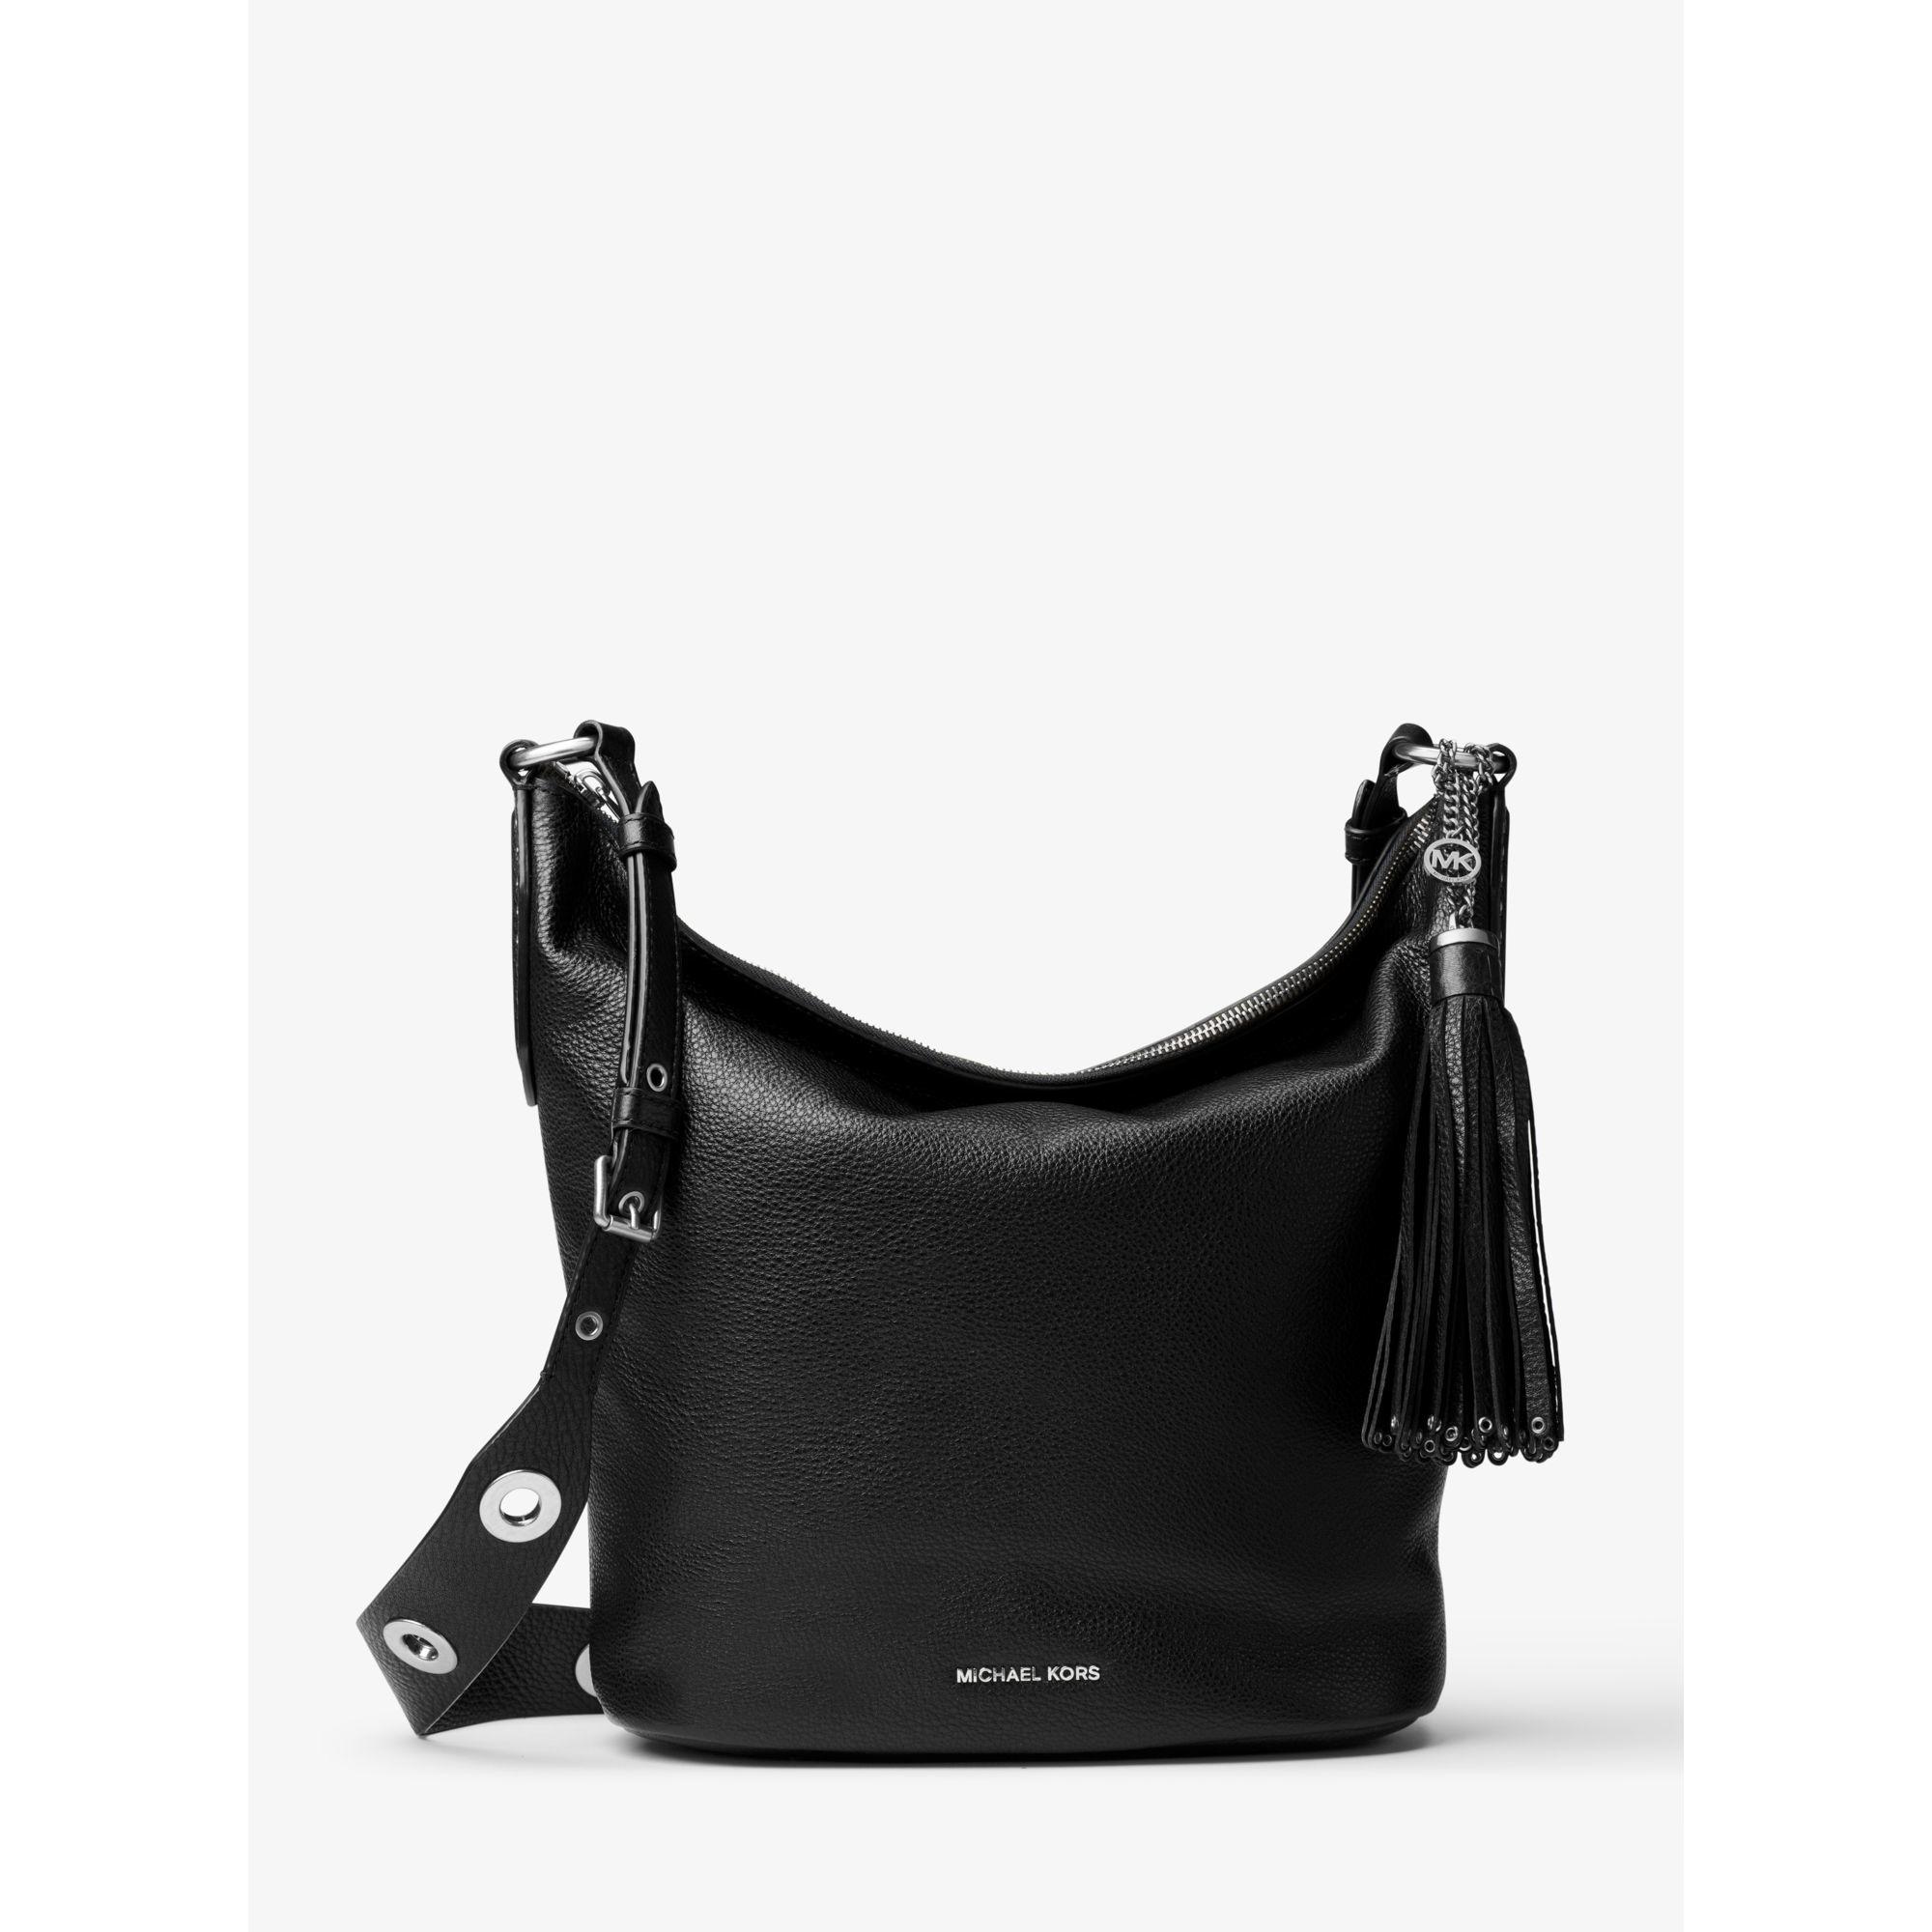 b07c3480985 Lyst - Michael Kors Brooklyn Large Leather Feed Bag in Black